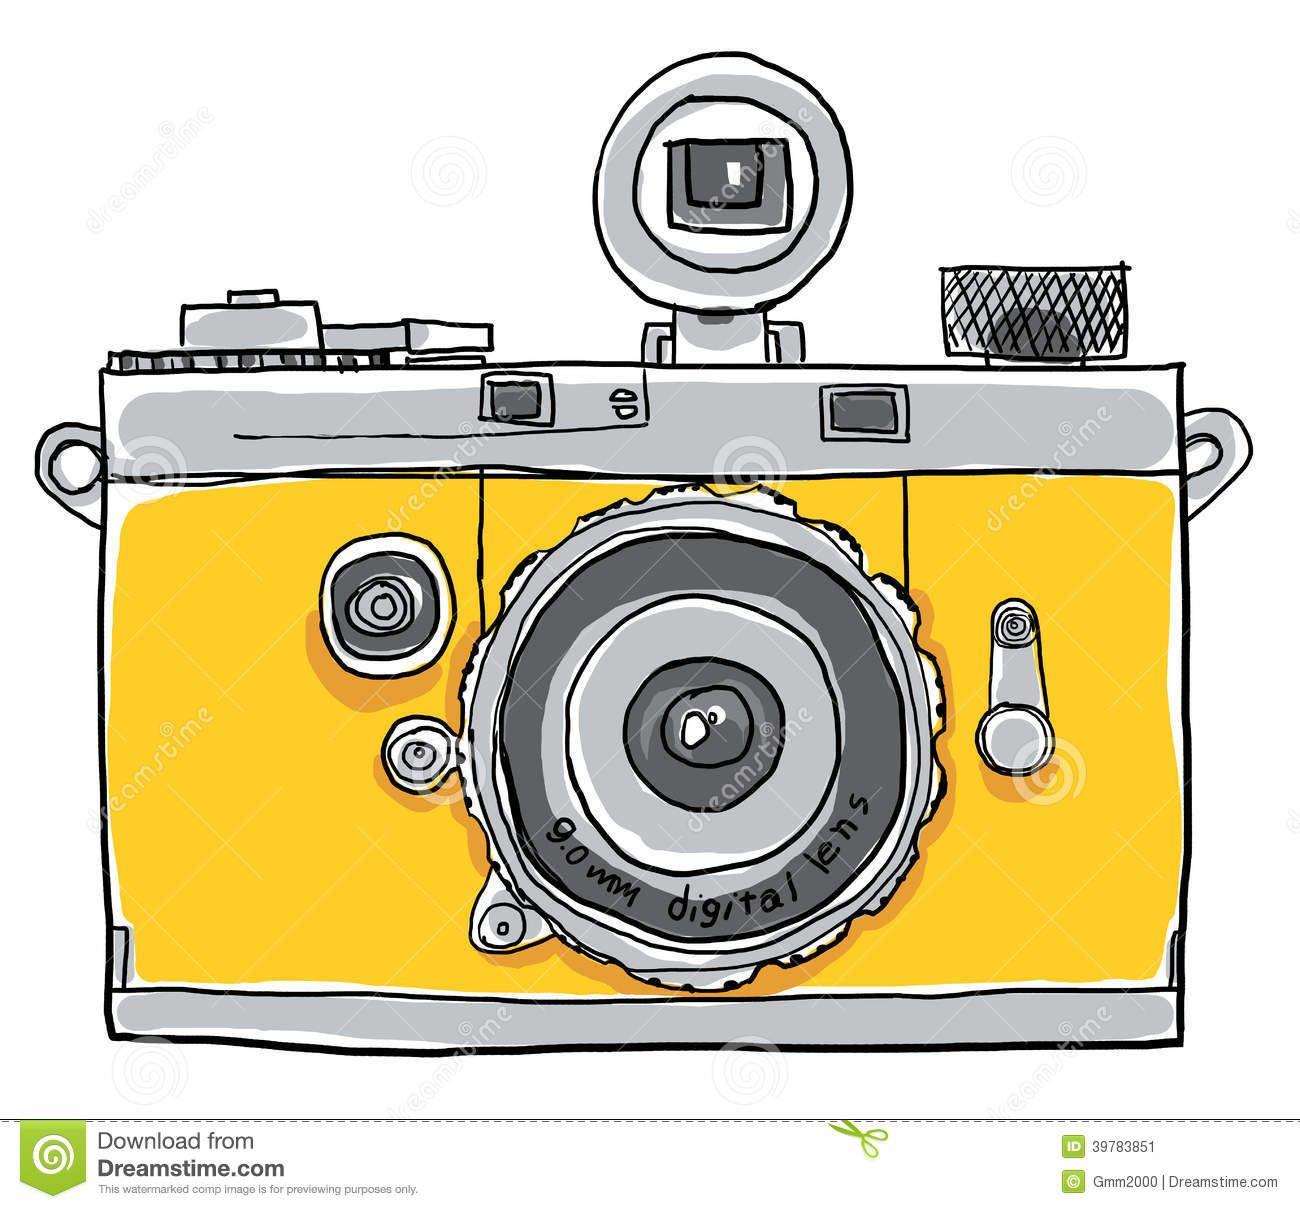 Yellow Camera Vintage Painting Line Art Stock Illustration - Image ...